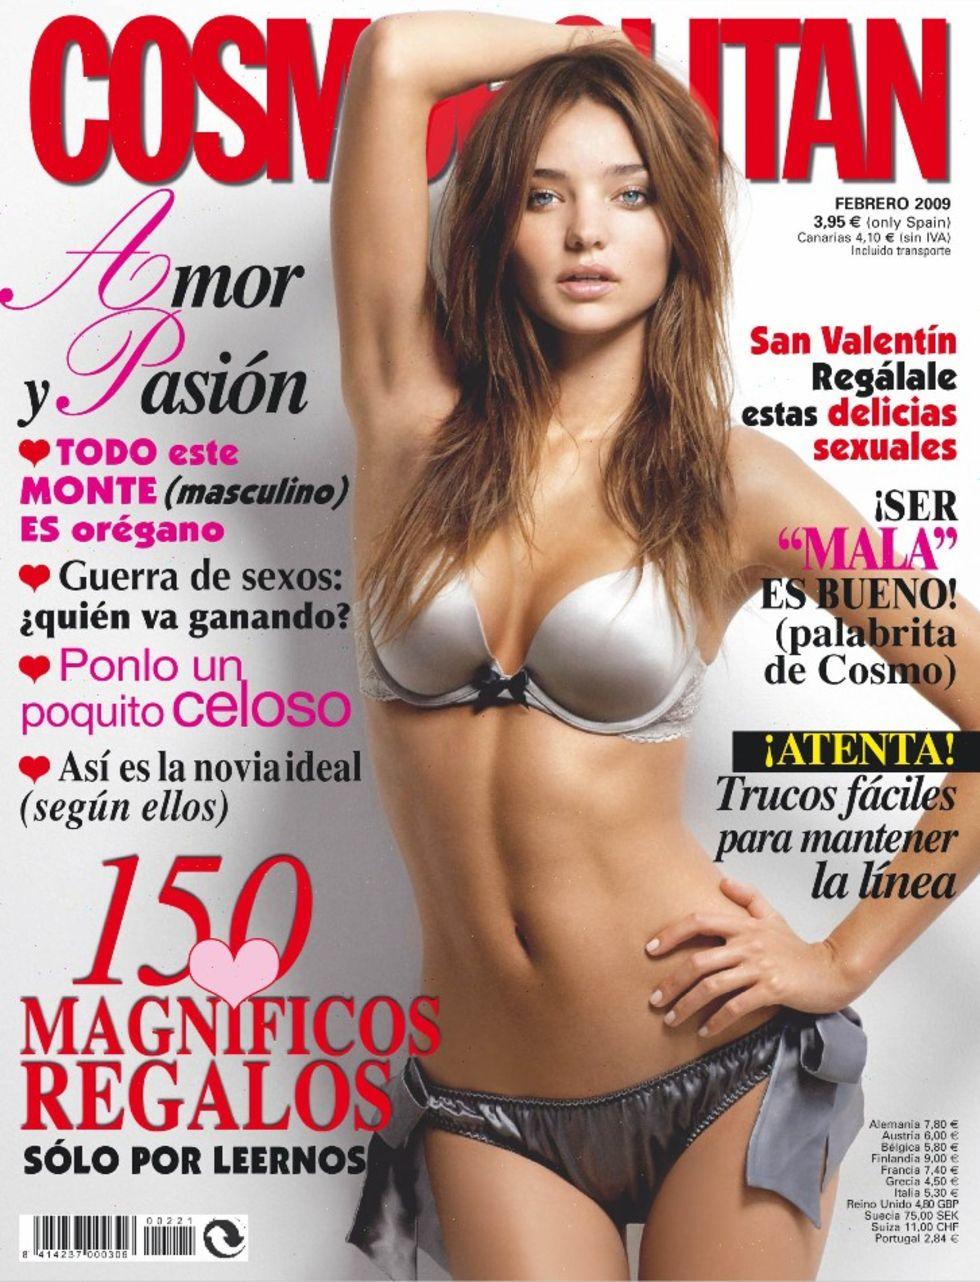 miranda-kerr-cosmopolitan-magazine-cover-february-2009-01